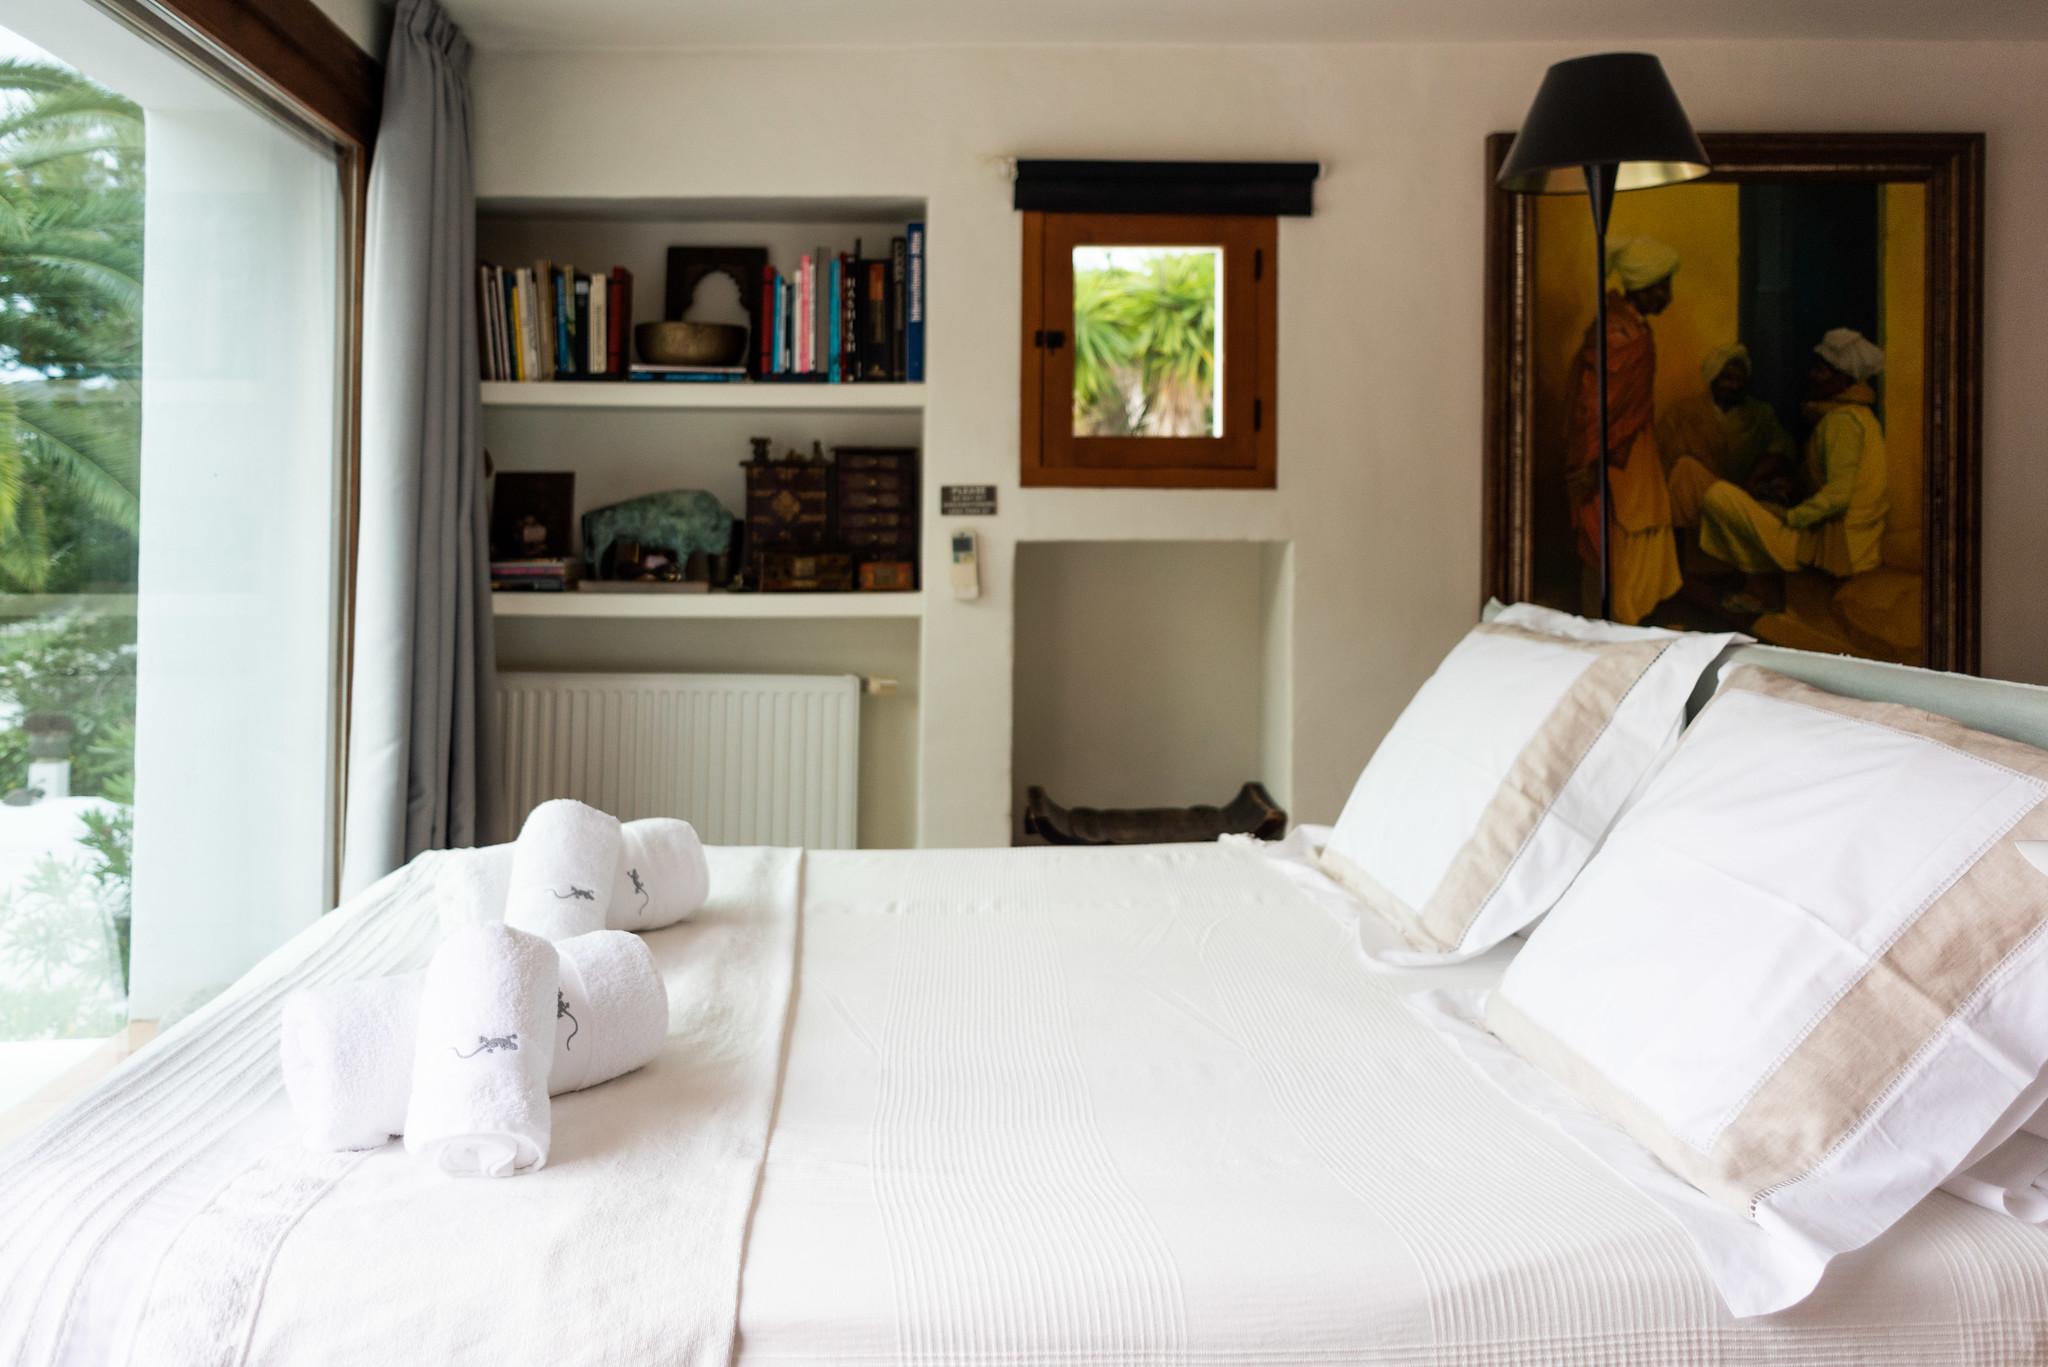 https://www.white-ibiza.com/wp-content/uploads/2020/05/white-ibiza-villas-can-lyra-bedroom.jpg